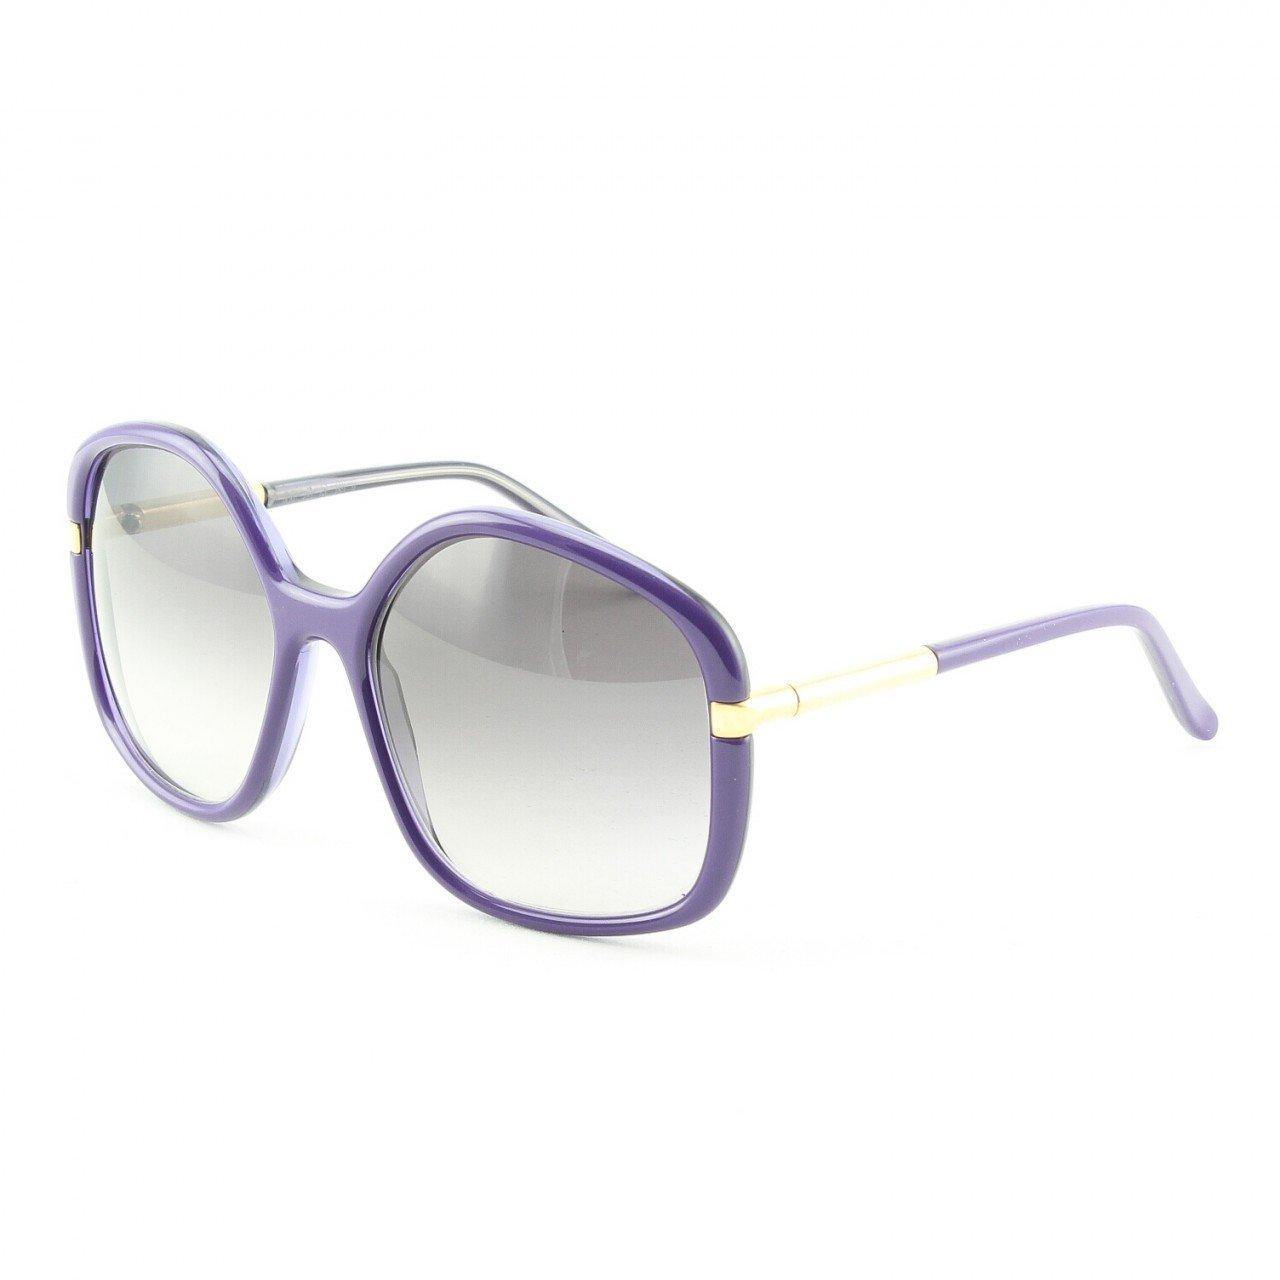 Marni MA211 Sunglasses Col. 04 Purple Frame Gold Trim with Gray Gradient Lenses